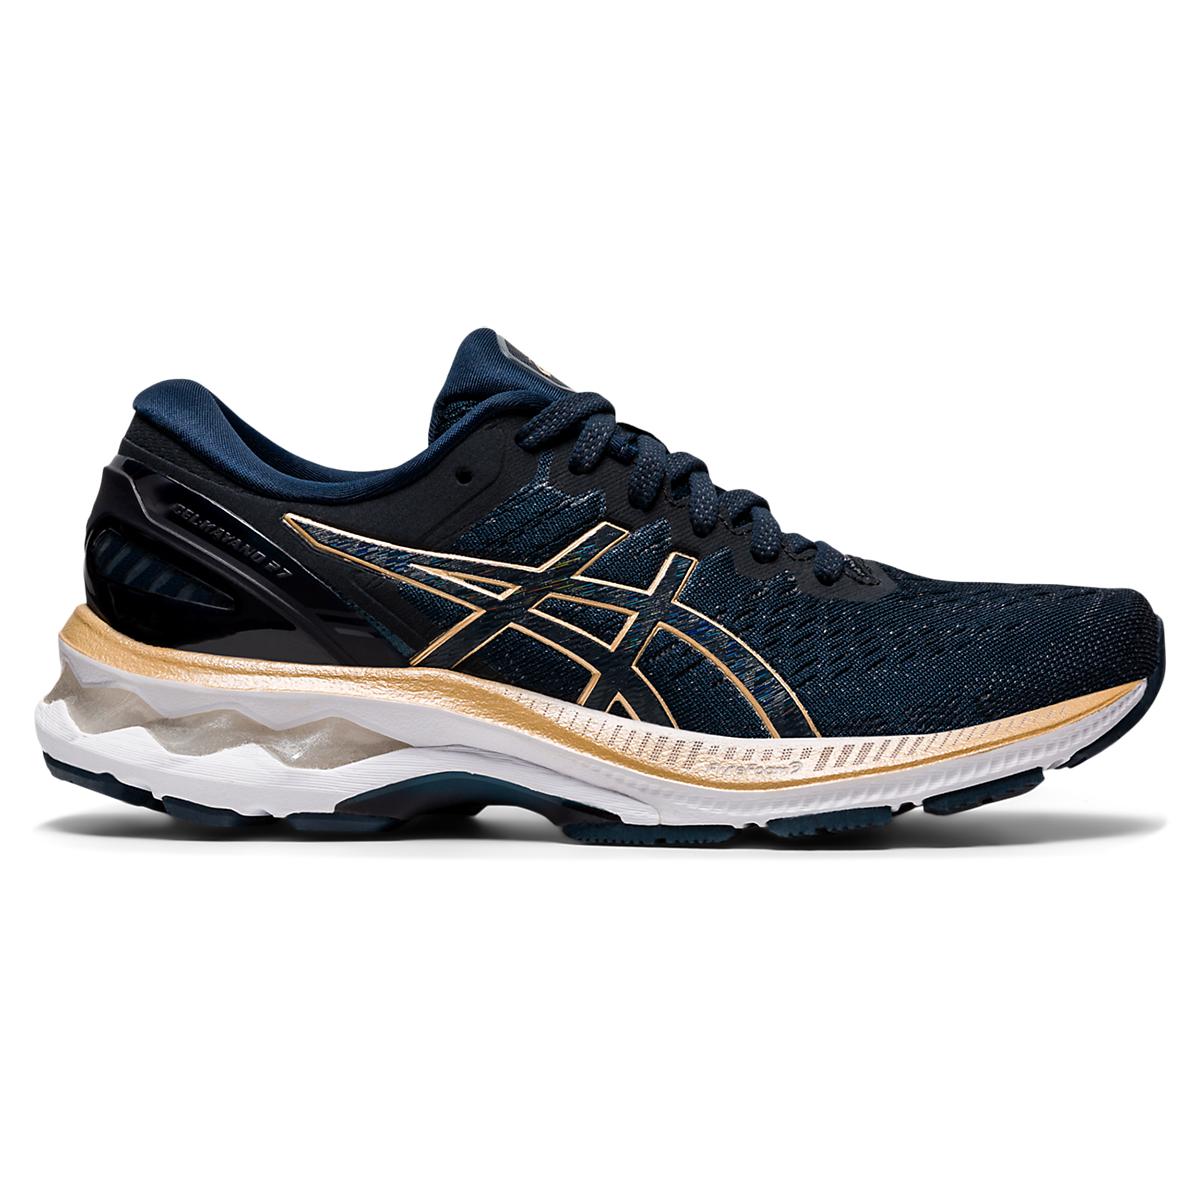 Women's Asics Gel-Kayano 27 Running Shoe - Color: French Blue/Black/Orange - Size: 5 - Width: Regular, French Blue/Black/Orange, large, image 1